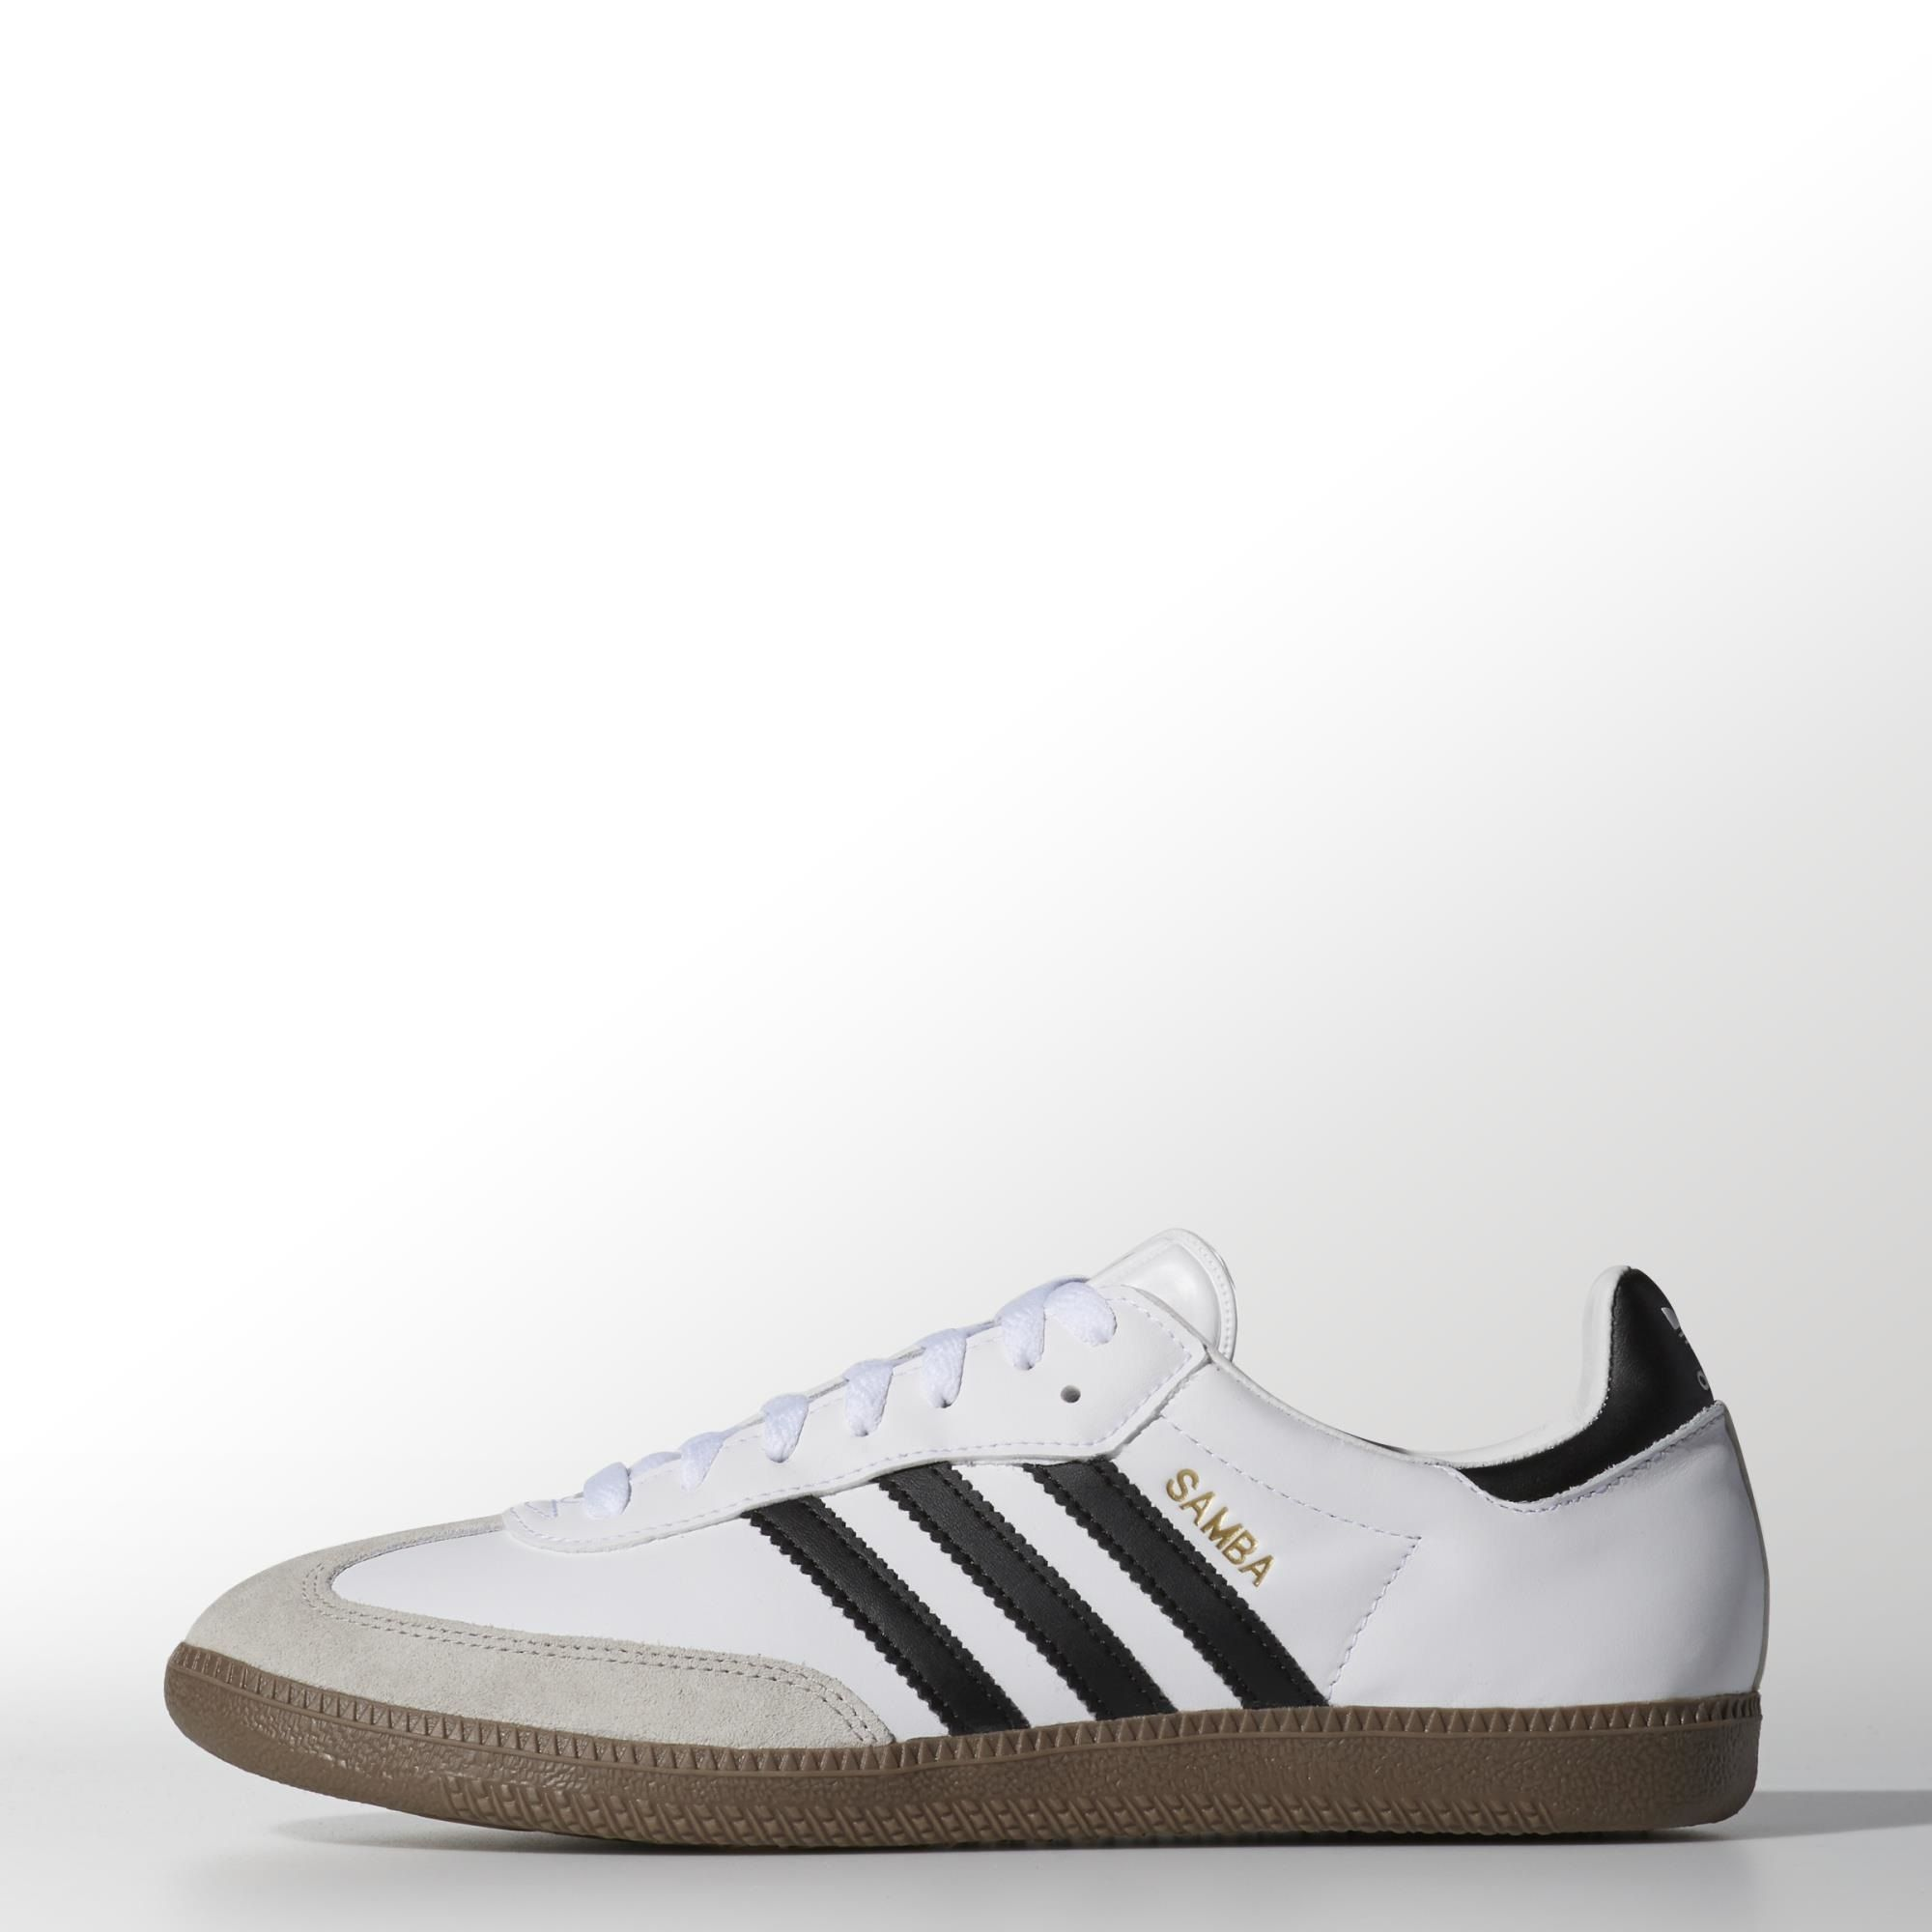 adidas samba mens uk